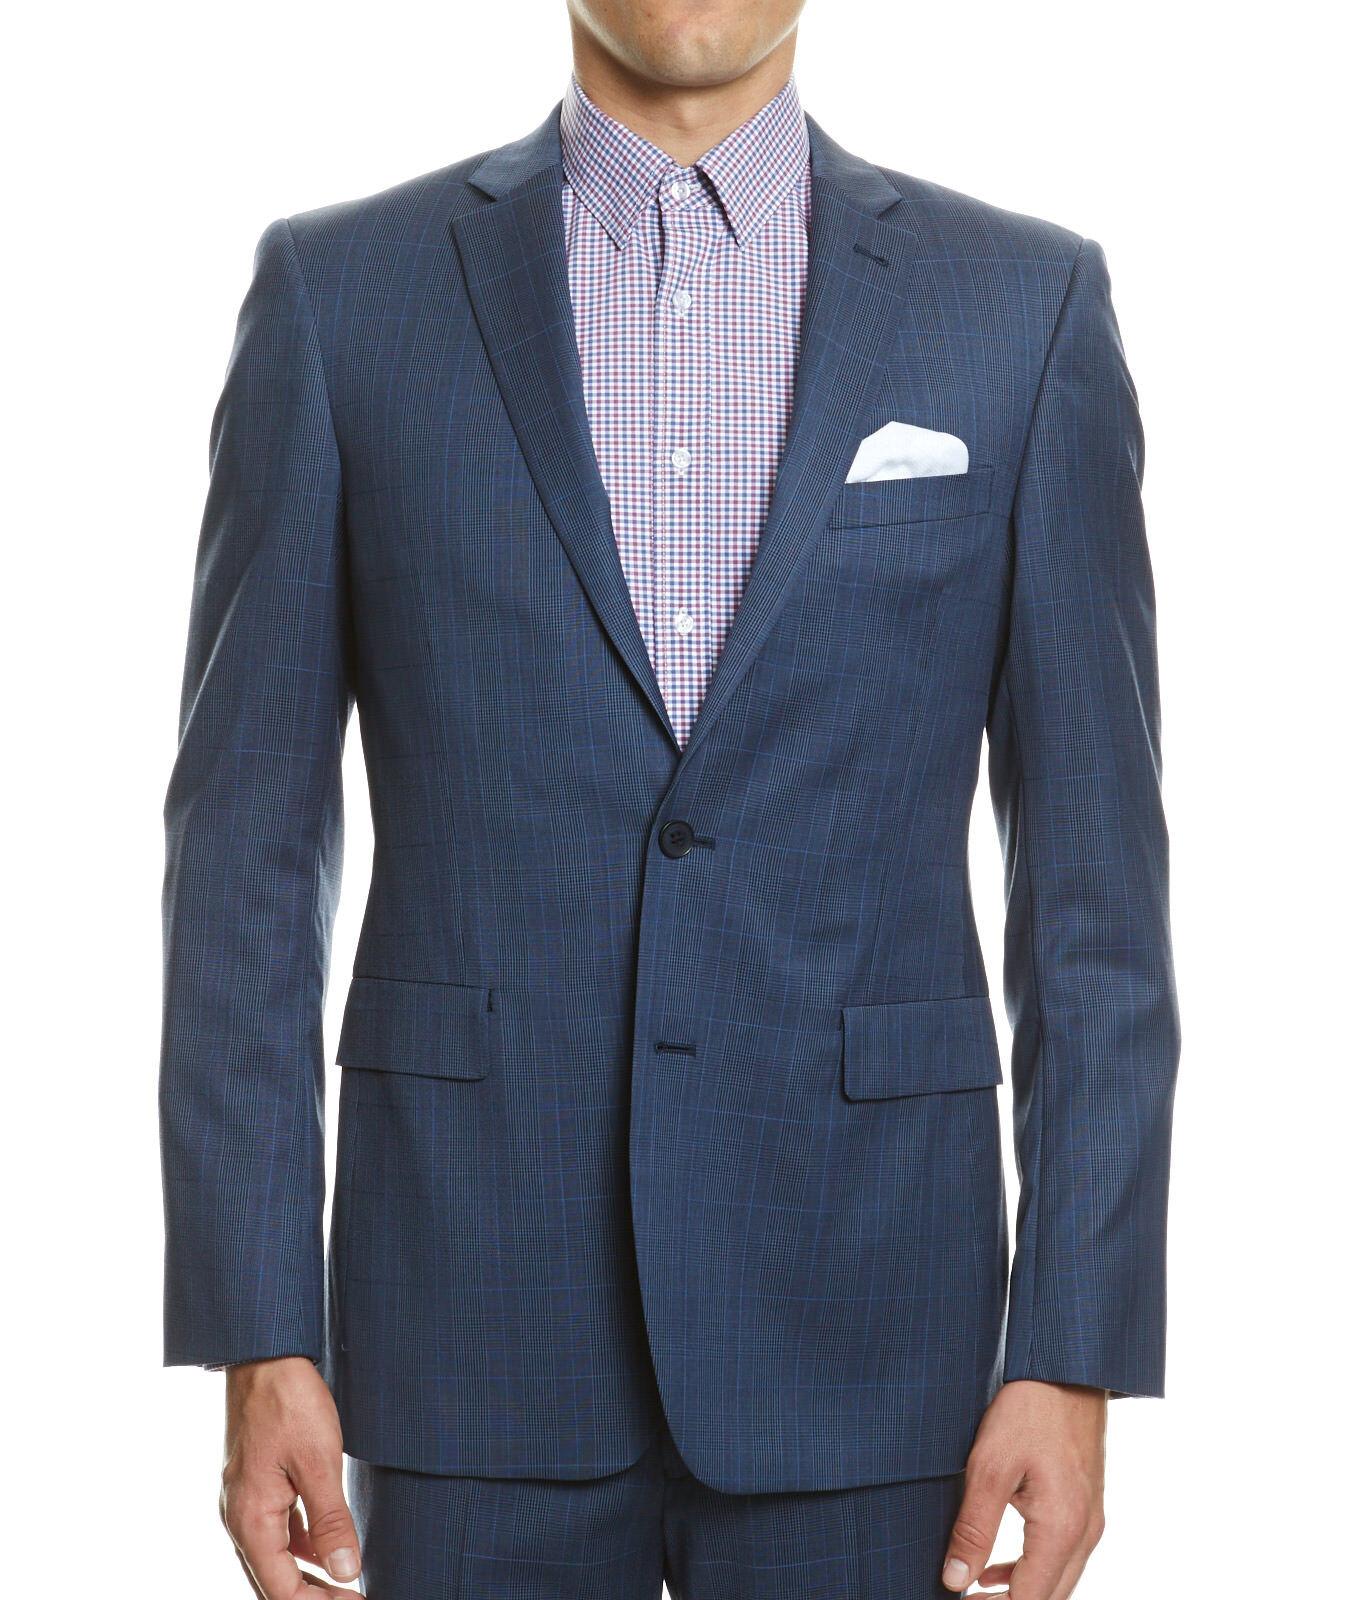 saba check suit jacketsmokeblue3897